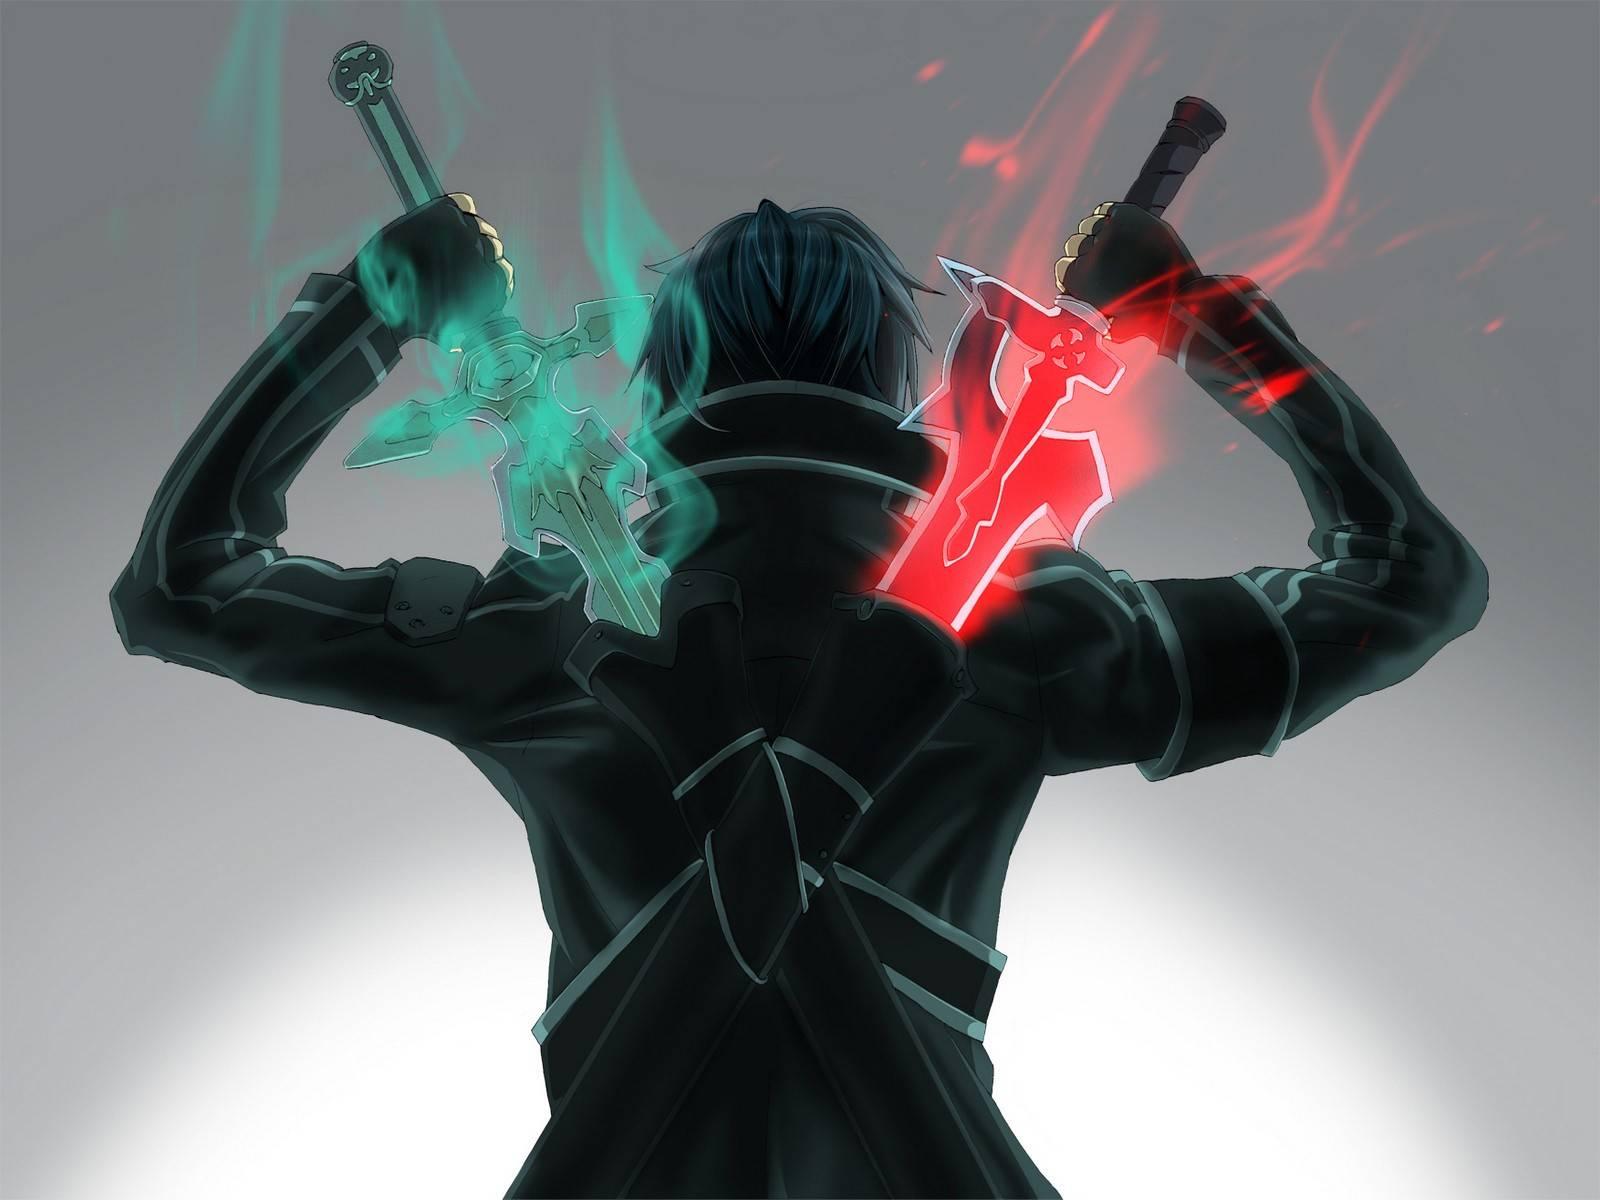 stuffpoint anime anime manga images pictures epic kirito backshot 1600x1200